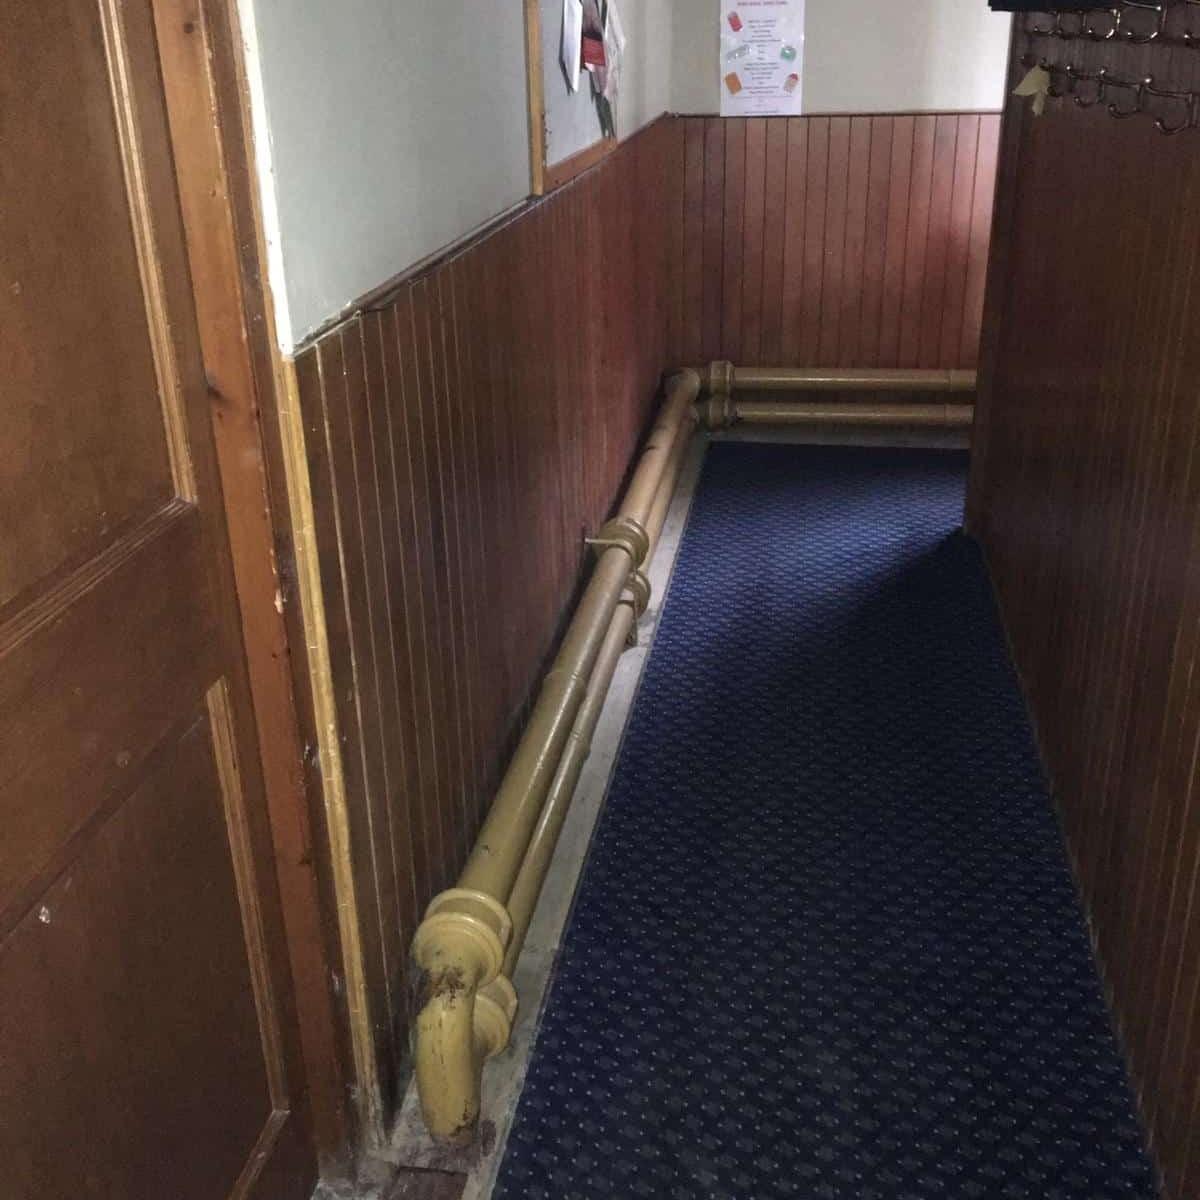 Photos from Bishopton Parish Church heating system 27